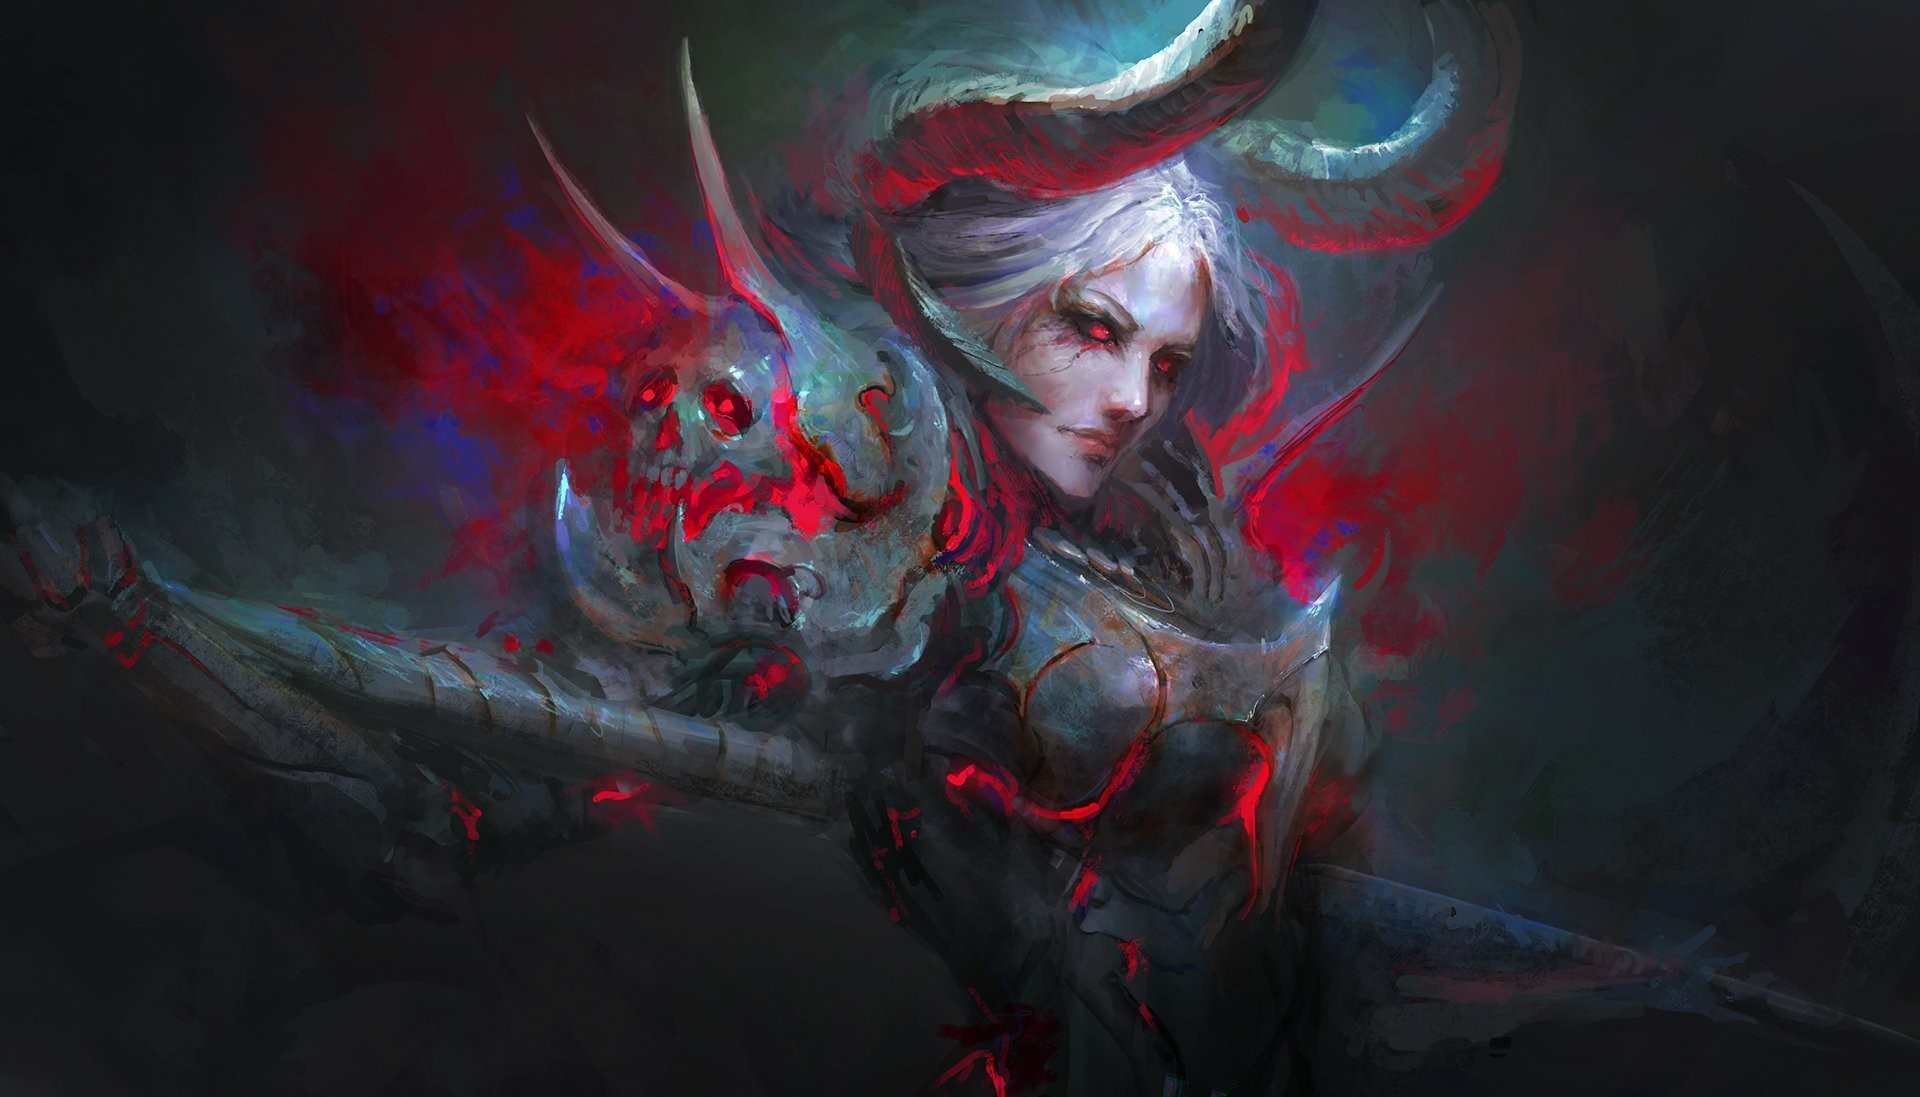 Female Demon Wallpaper (70+ images)  Female Demon Wa...